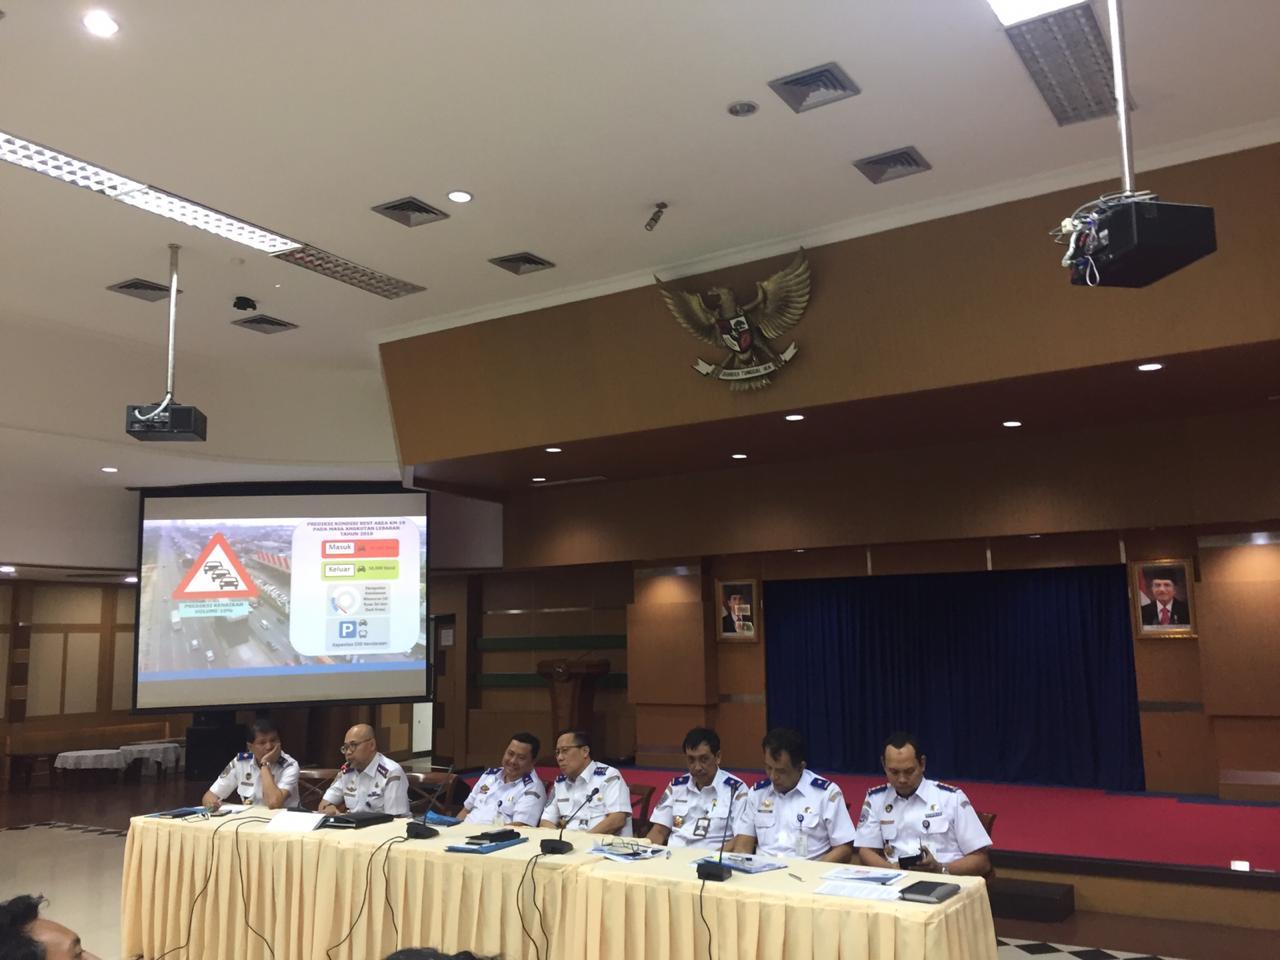 Kemenhub Investigasi Harga Tiket Pesawat Jakarta Surabaya